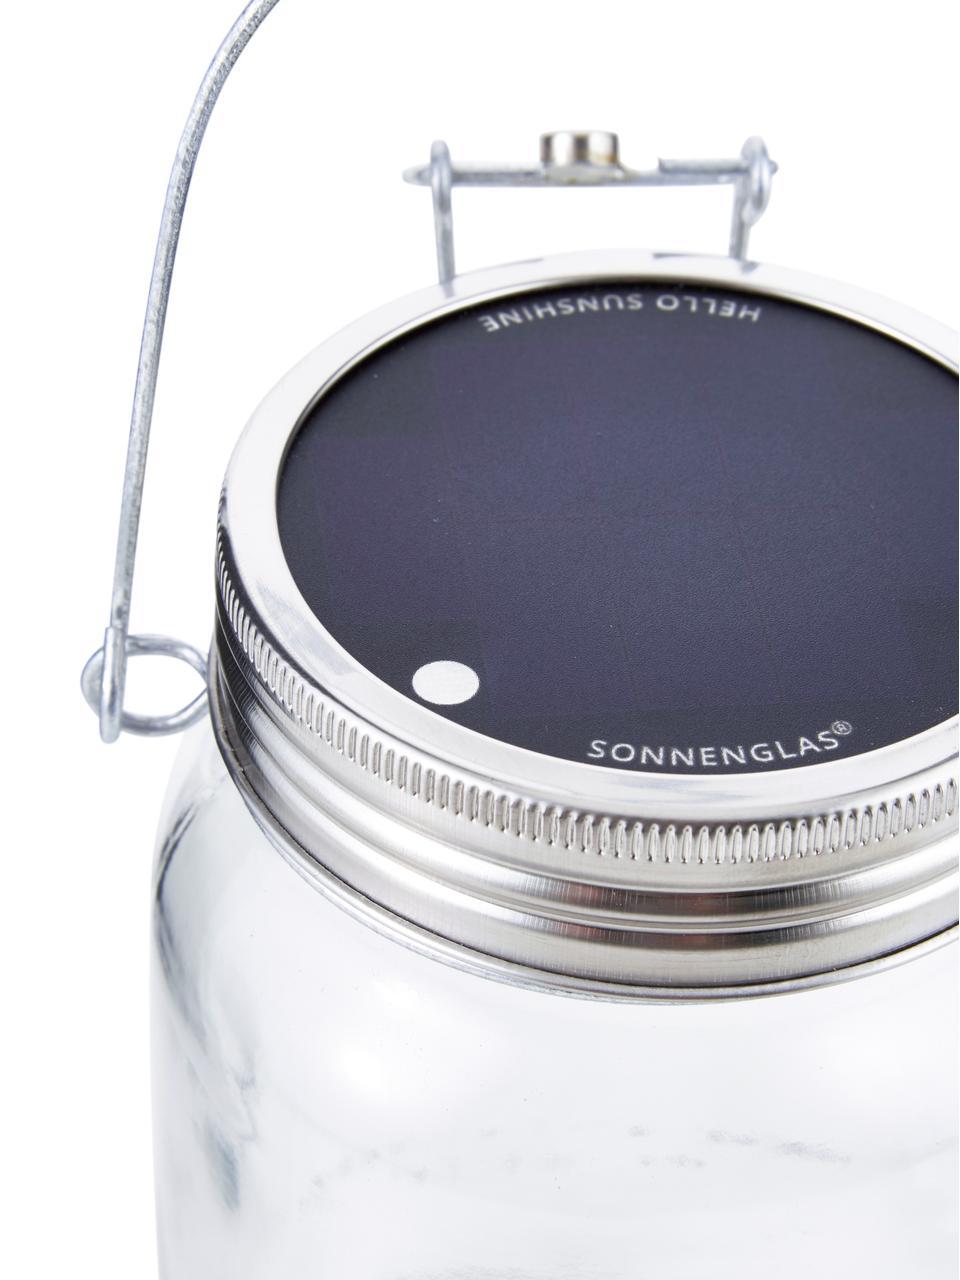 LED-Solarleuchte Sonnenglas, Behälter: Recyceltes Glas, Deckel: Edelstahl, Transparent, Edelstahl, Ø 12 x H 18 cm